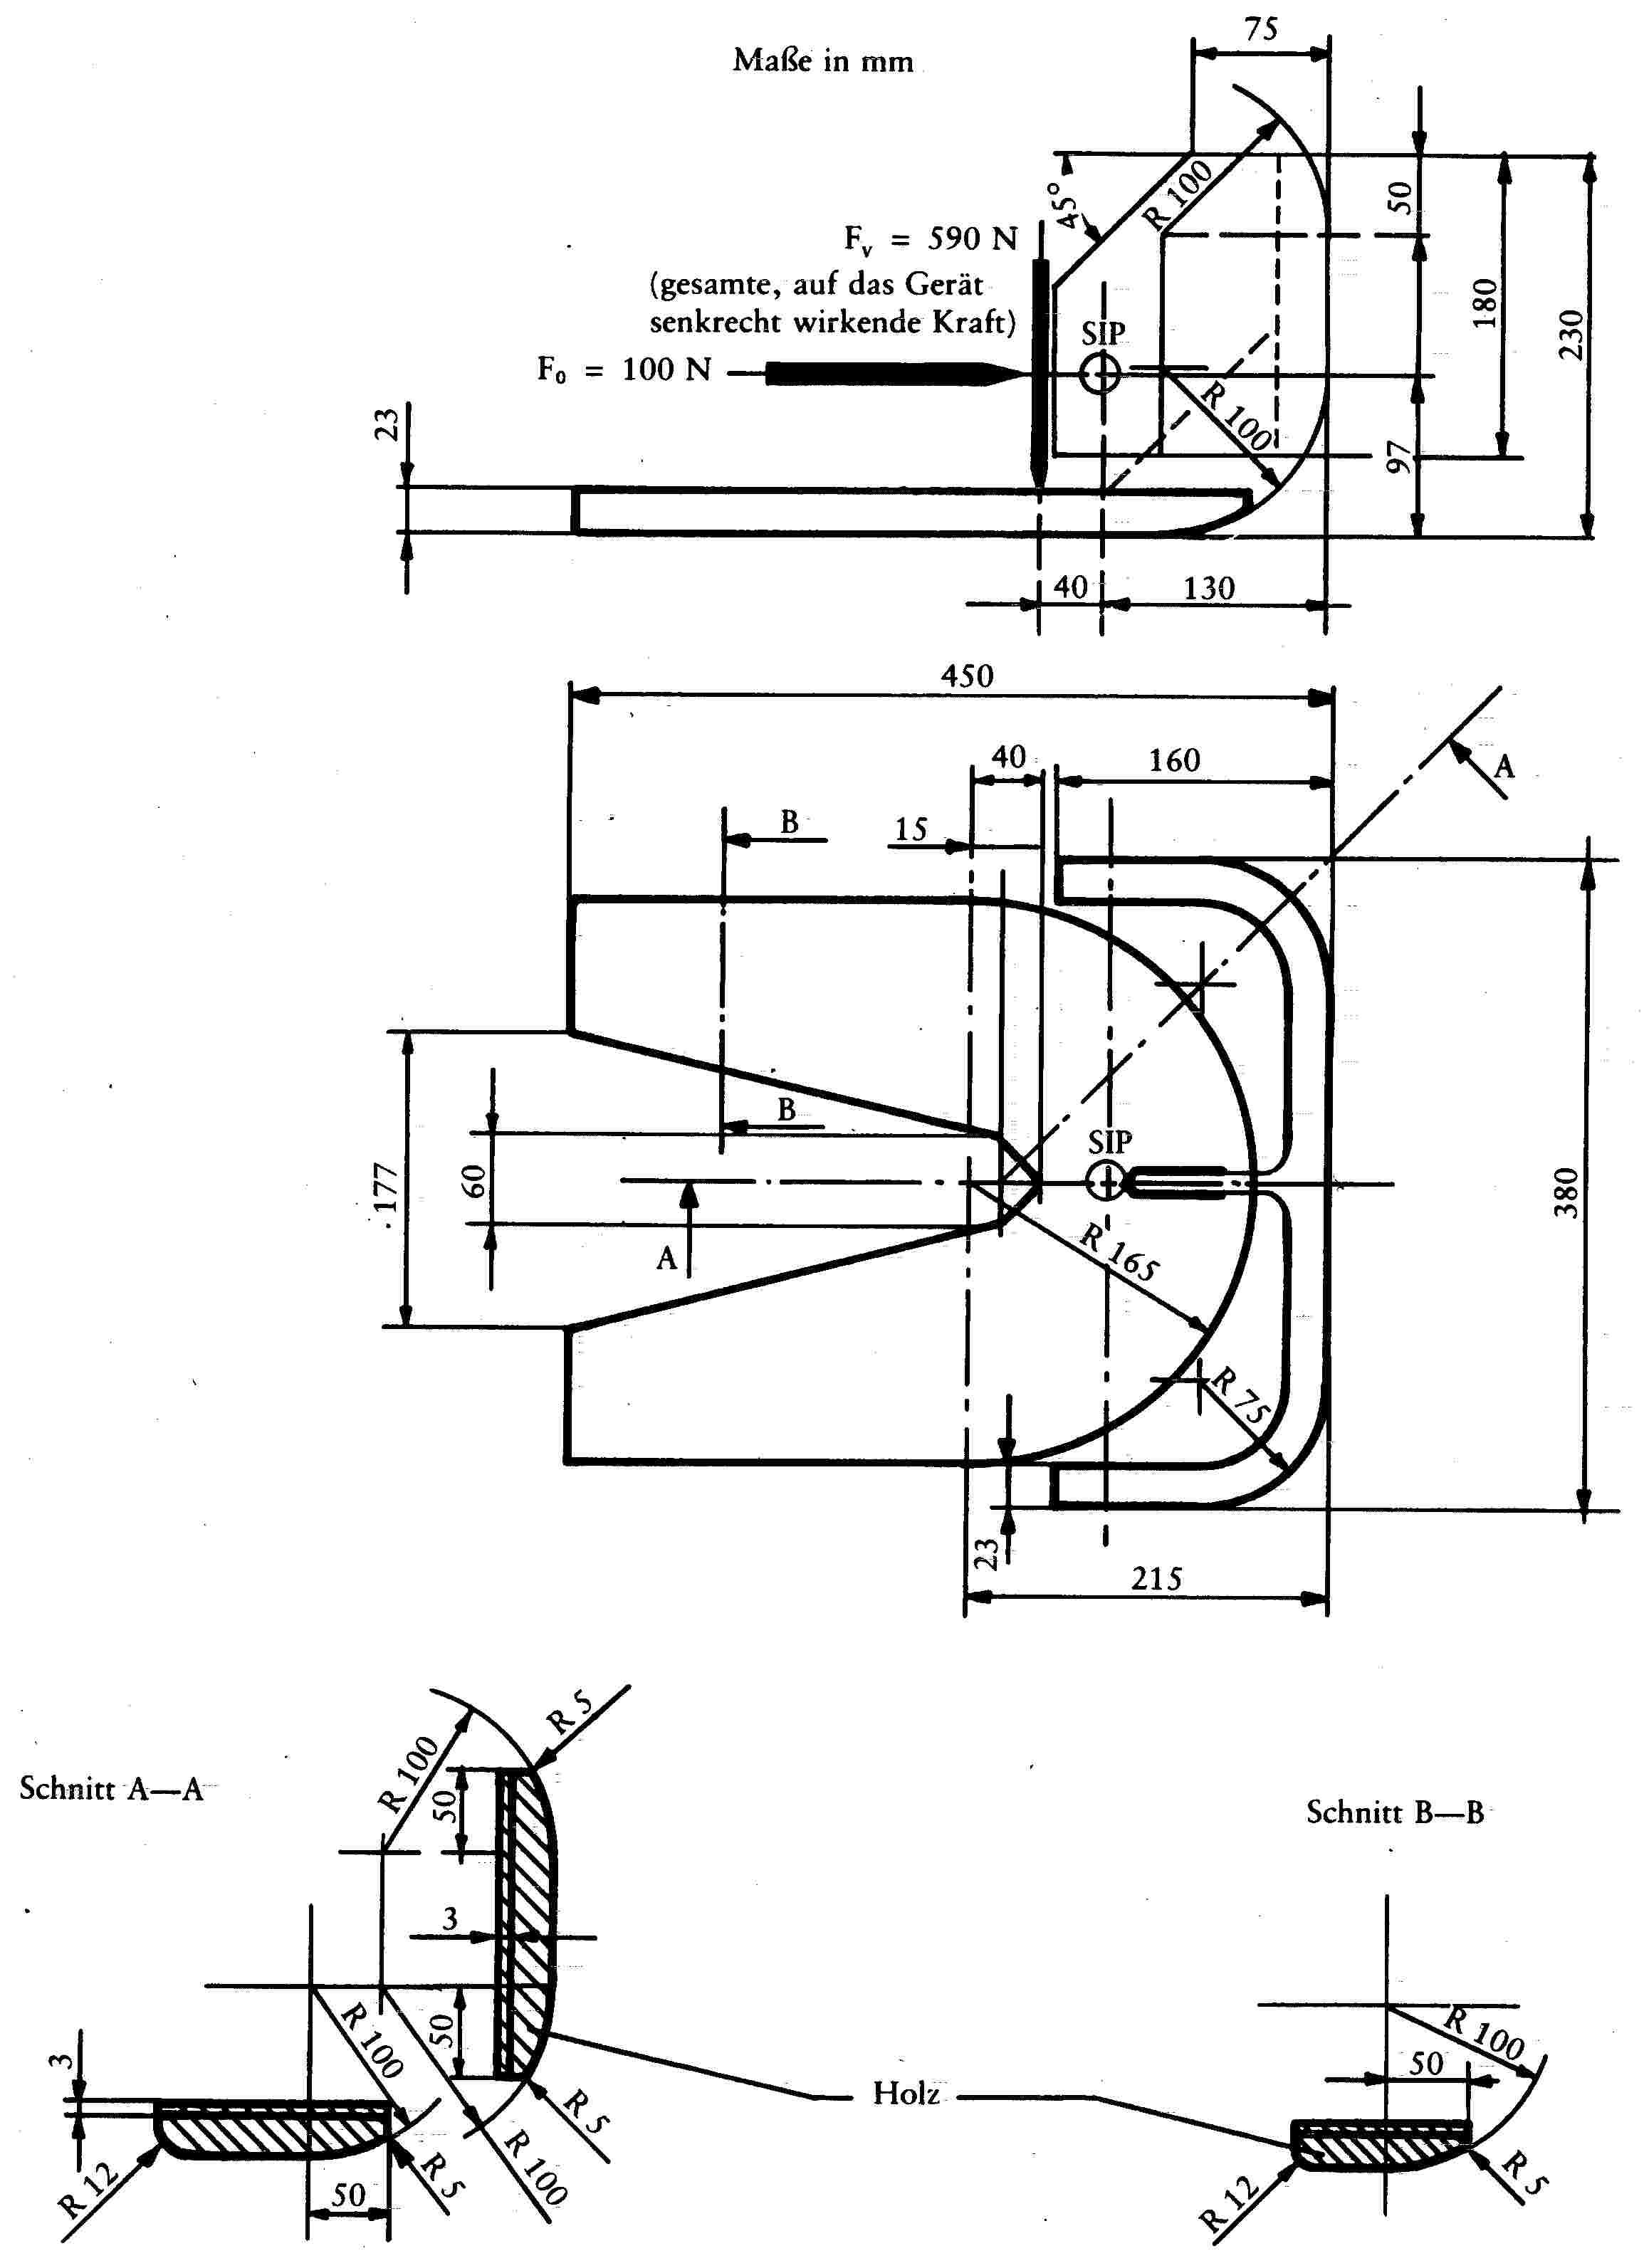 Berühmt 3 Draht Trocknungskabel Bilder - Schaltplan Serie Circuit ...